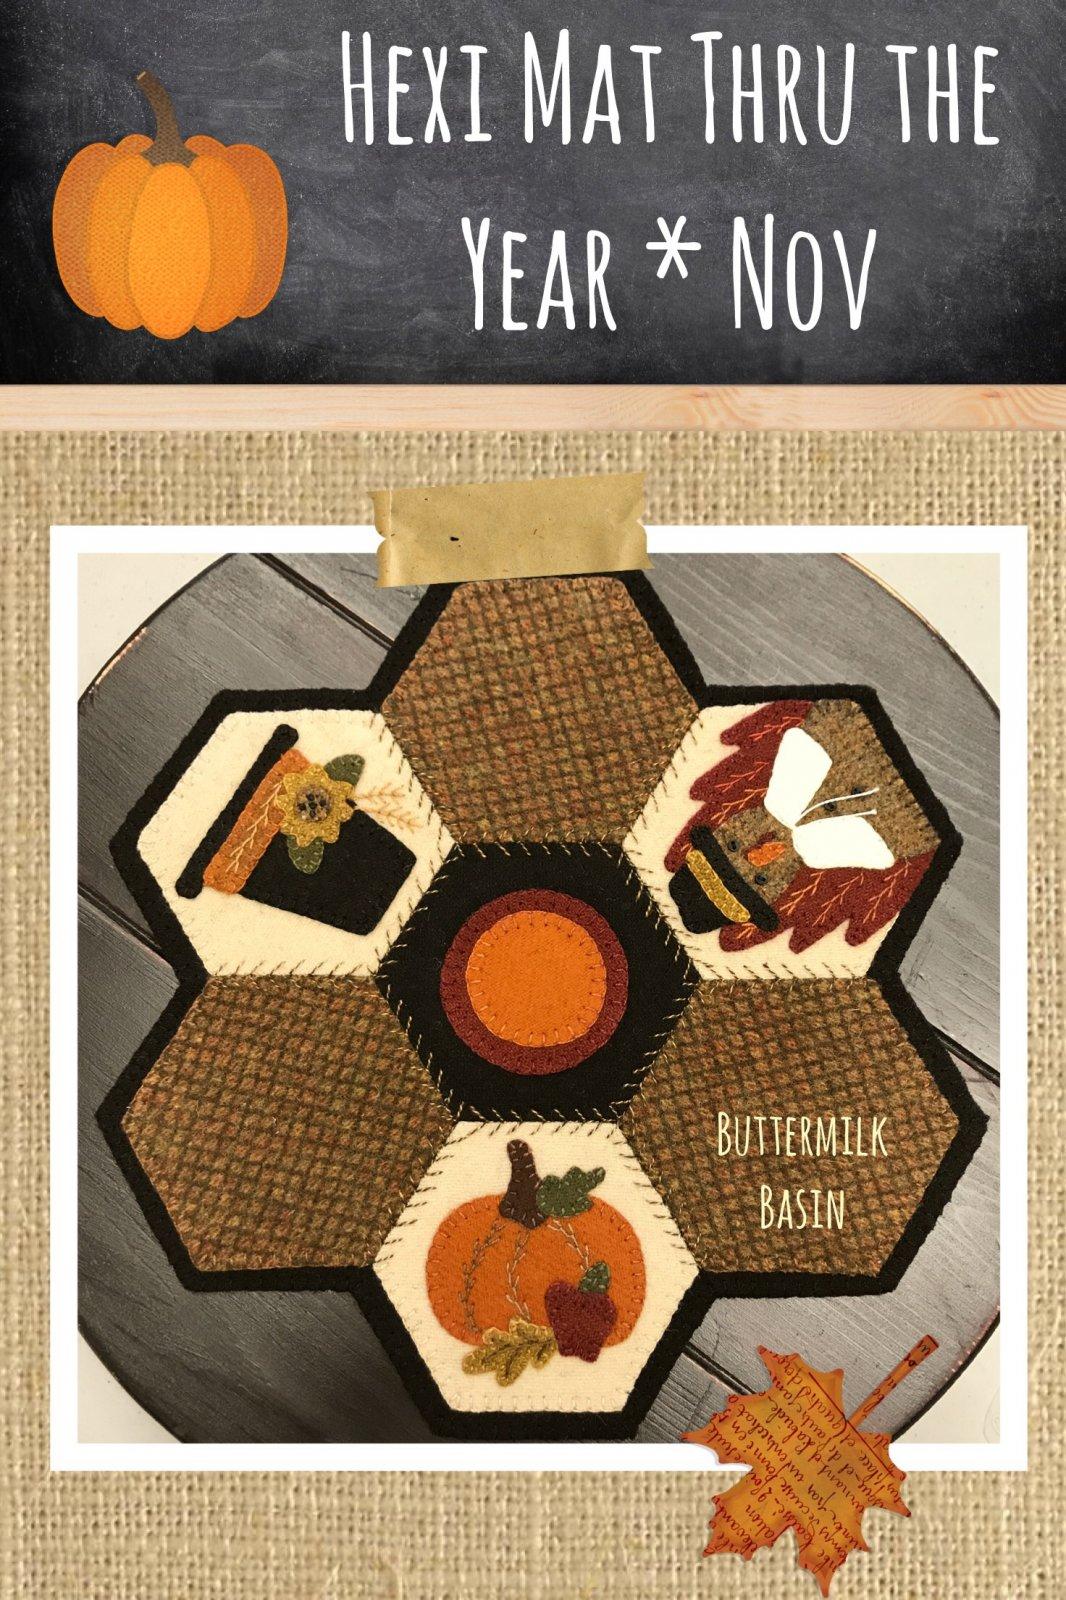 Hexi Mats thru the Year * November Pattern